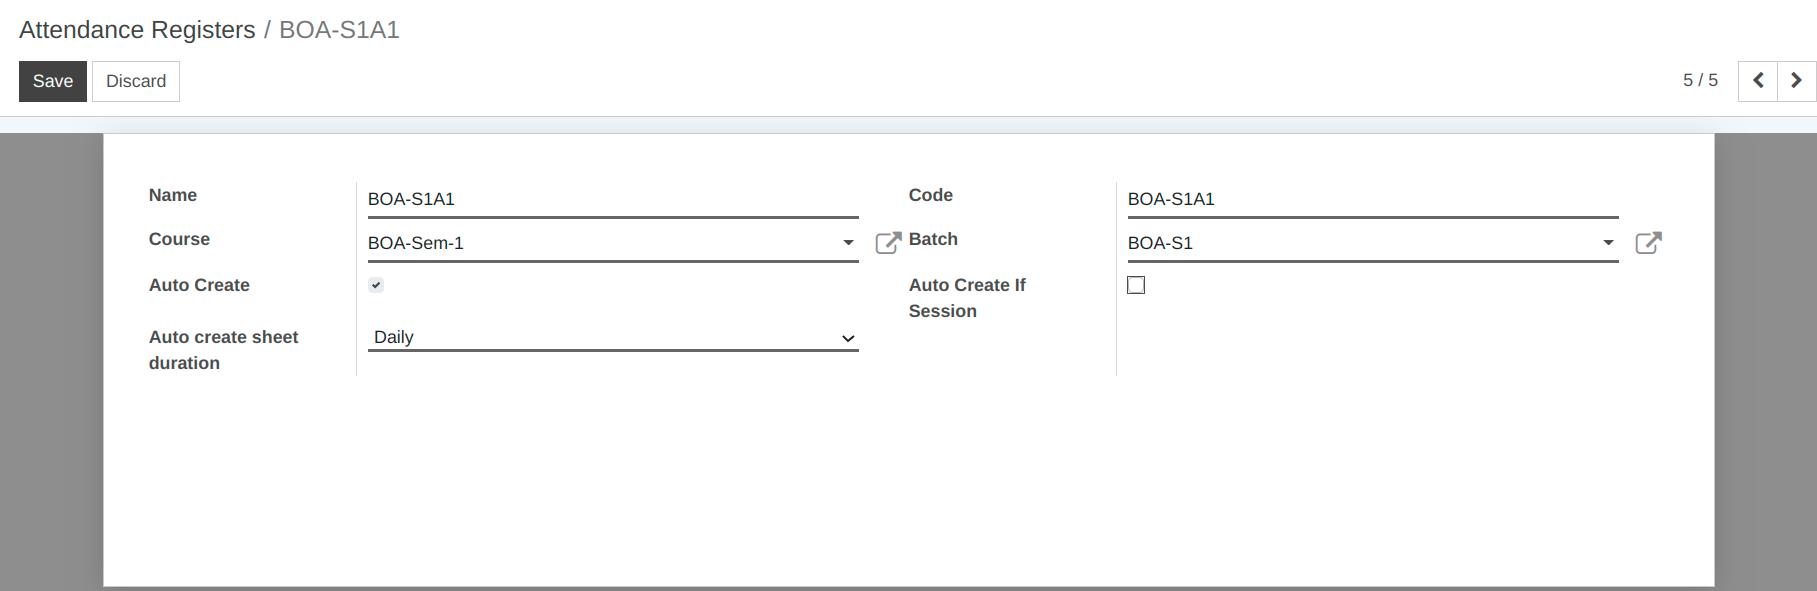 attendance register odoo 9 0 documentation